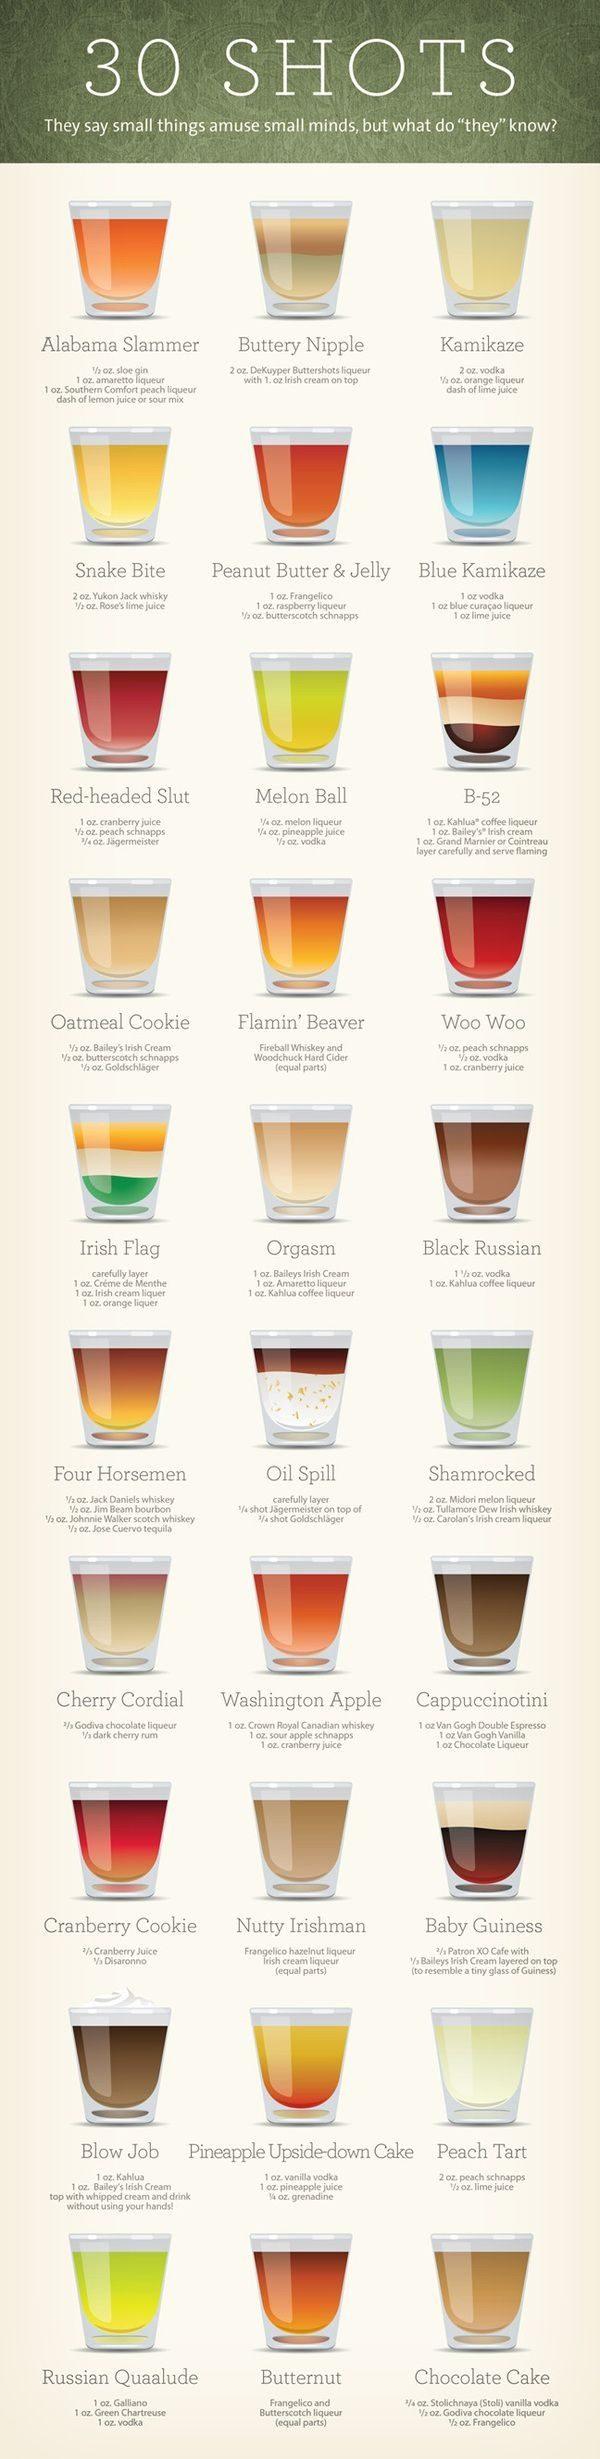 Roliga Shots recept